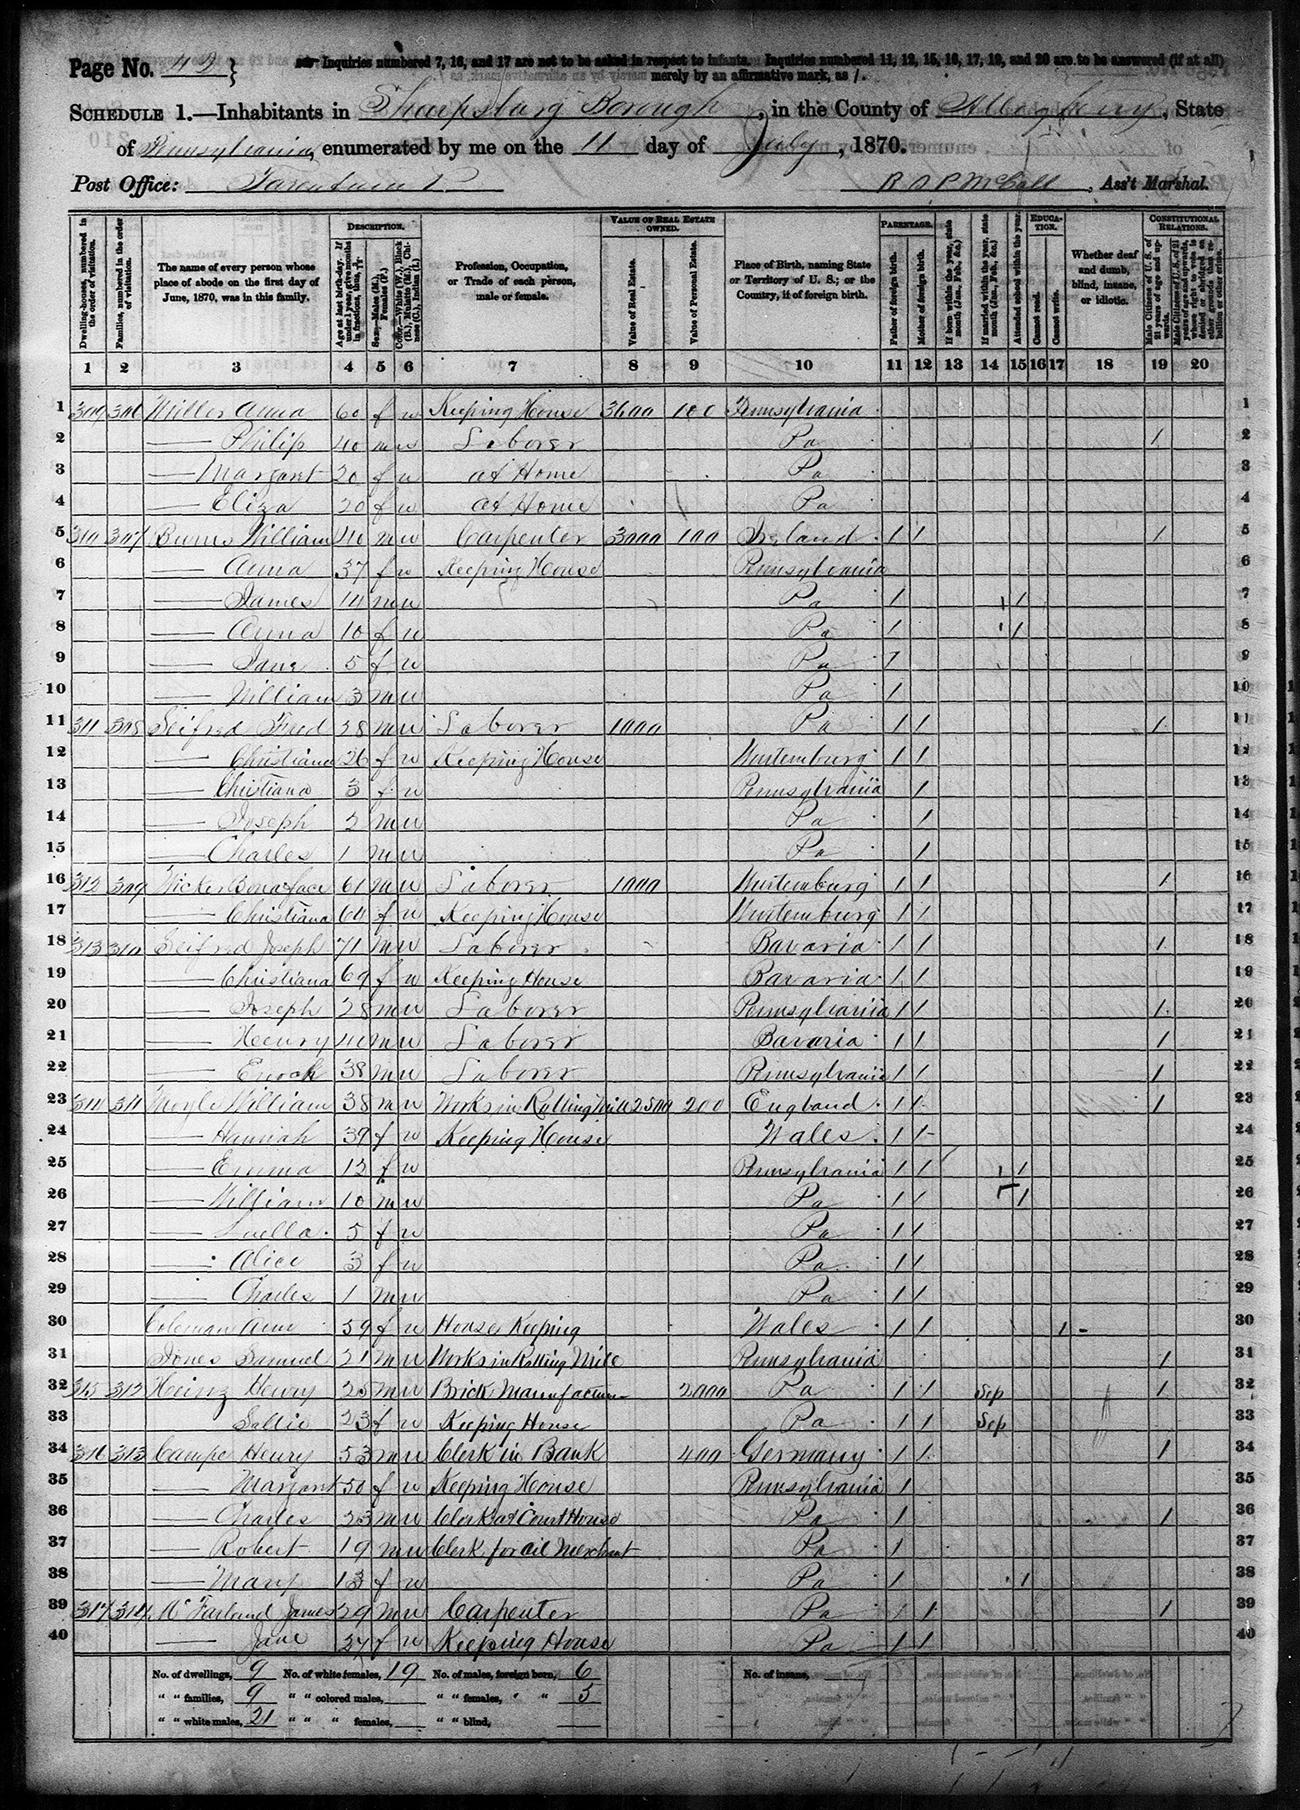 1930 census free uk dating